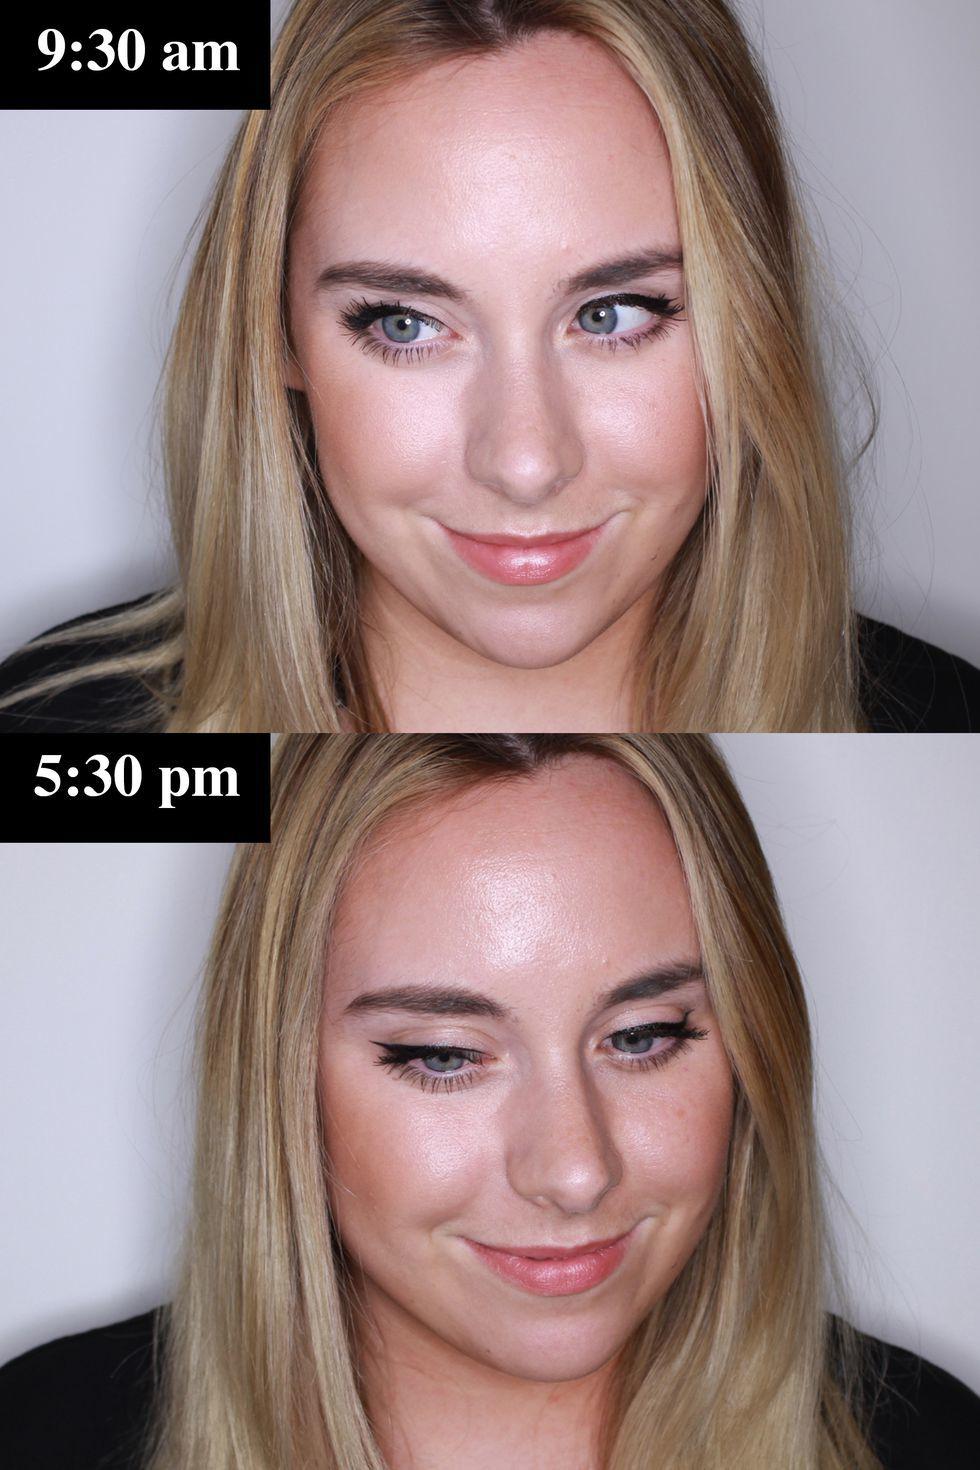 Матирующий фиксатор для макияжа Mattifying Setting Spray